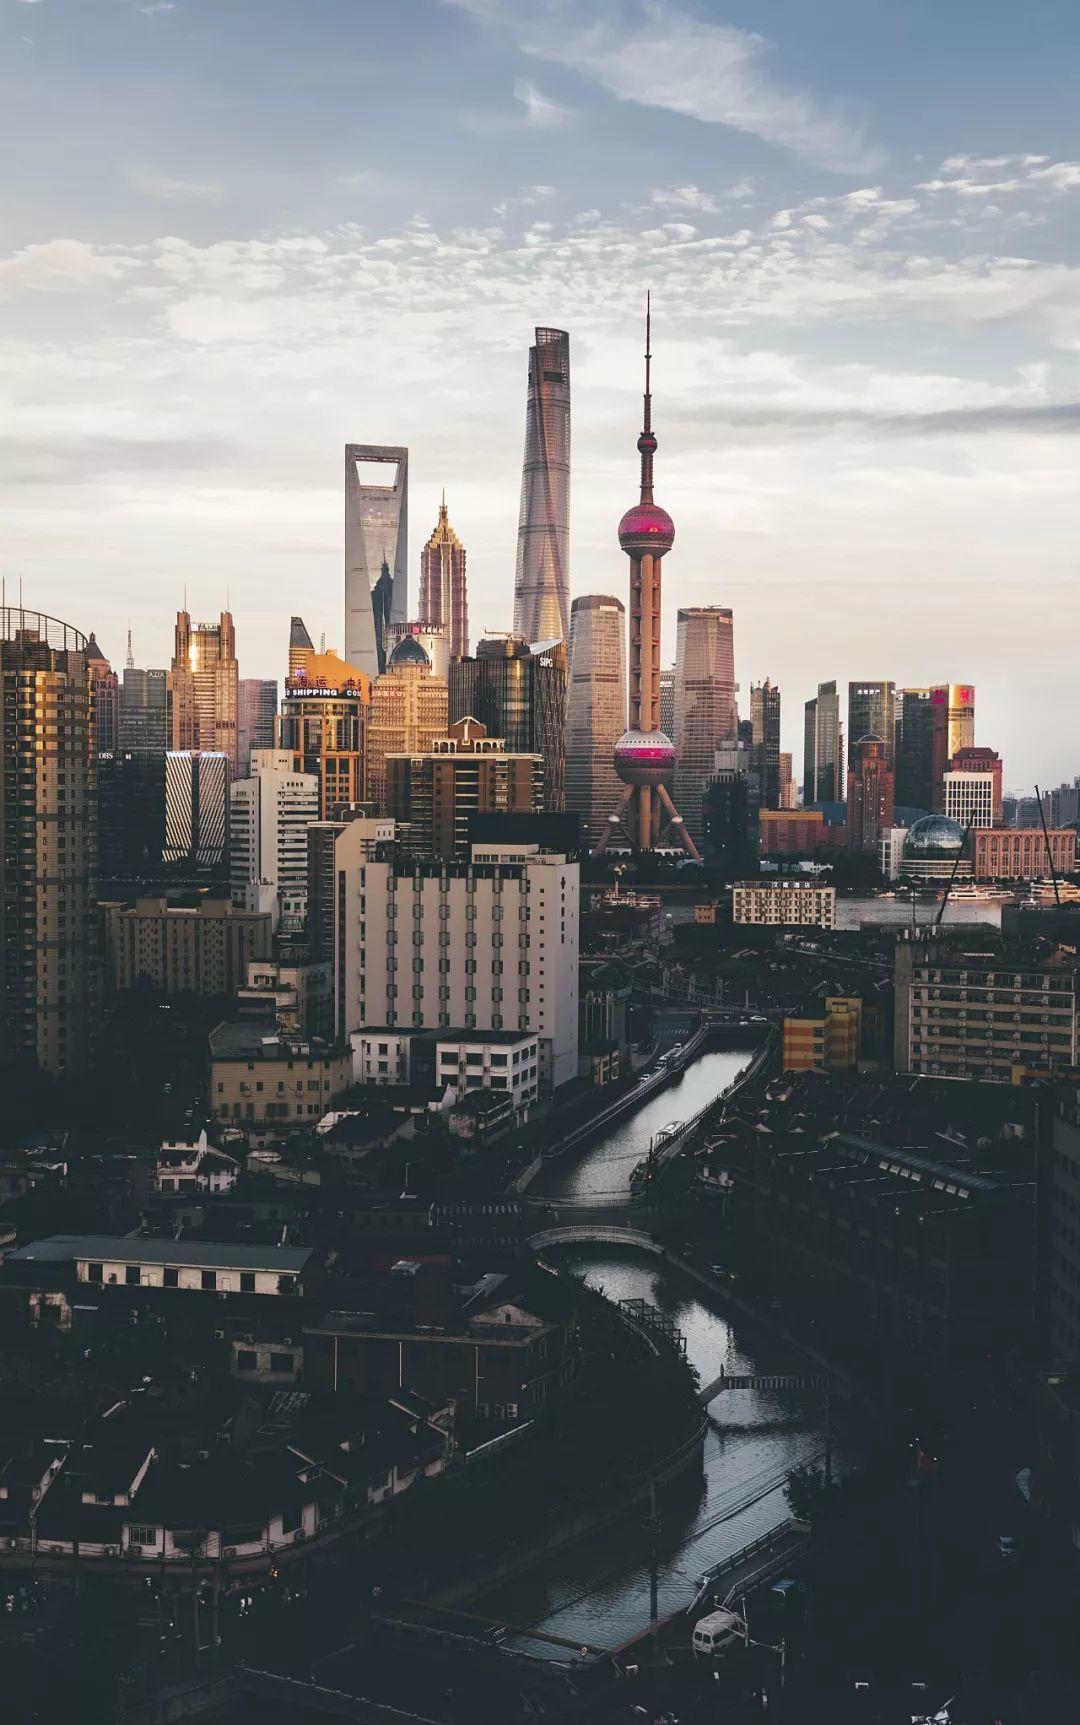 LDG动态︱喜迎建国70周年,海纳百川——上海市建筑学会建筑摄影大展